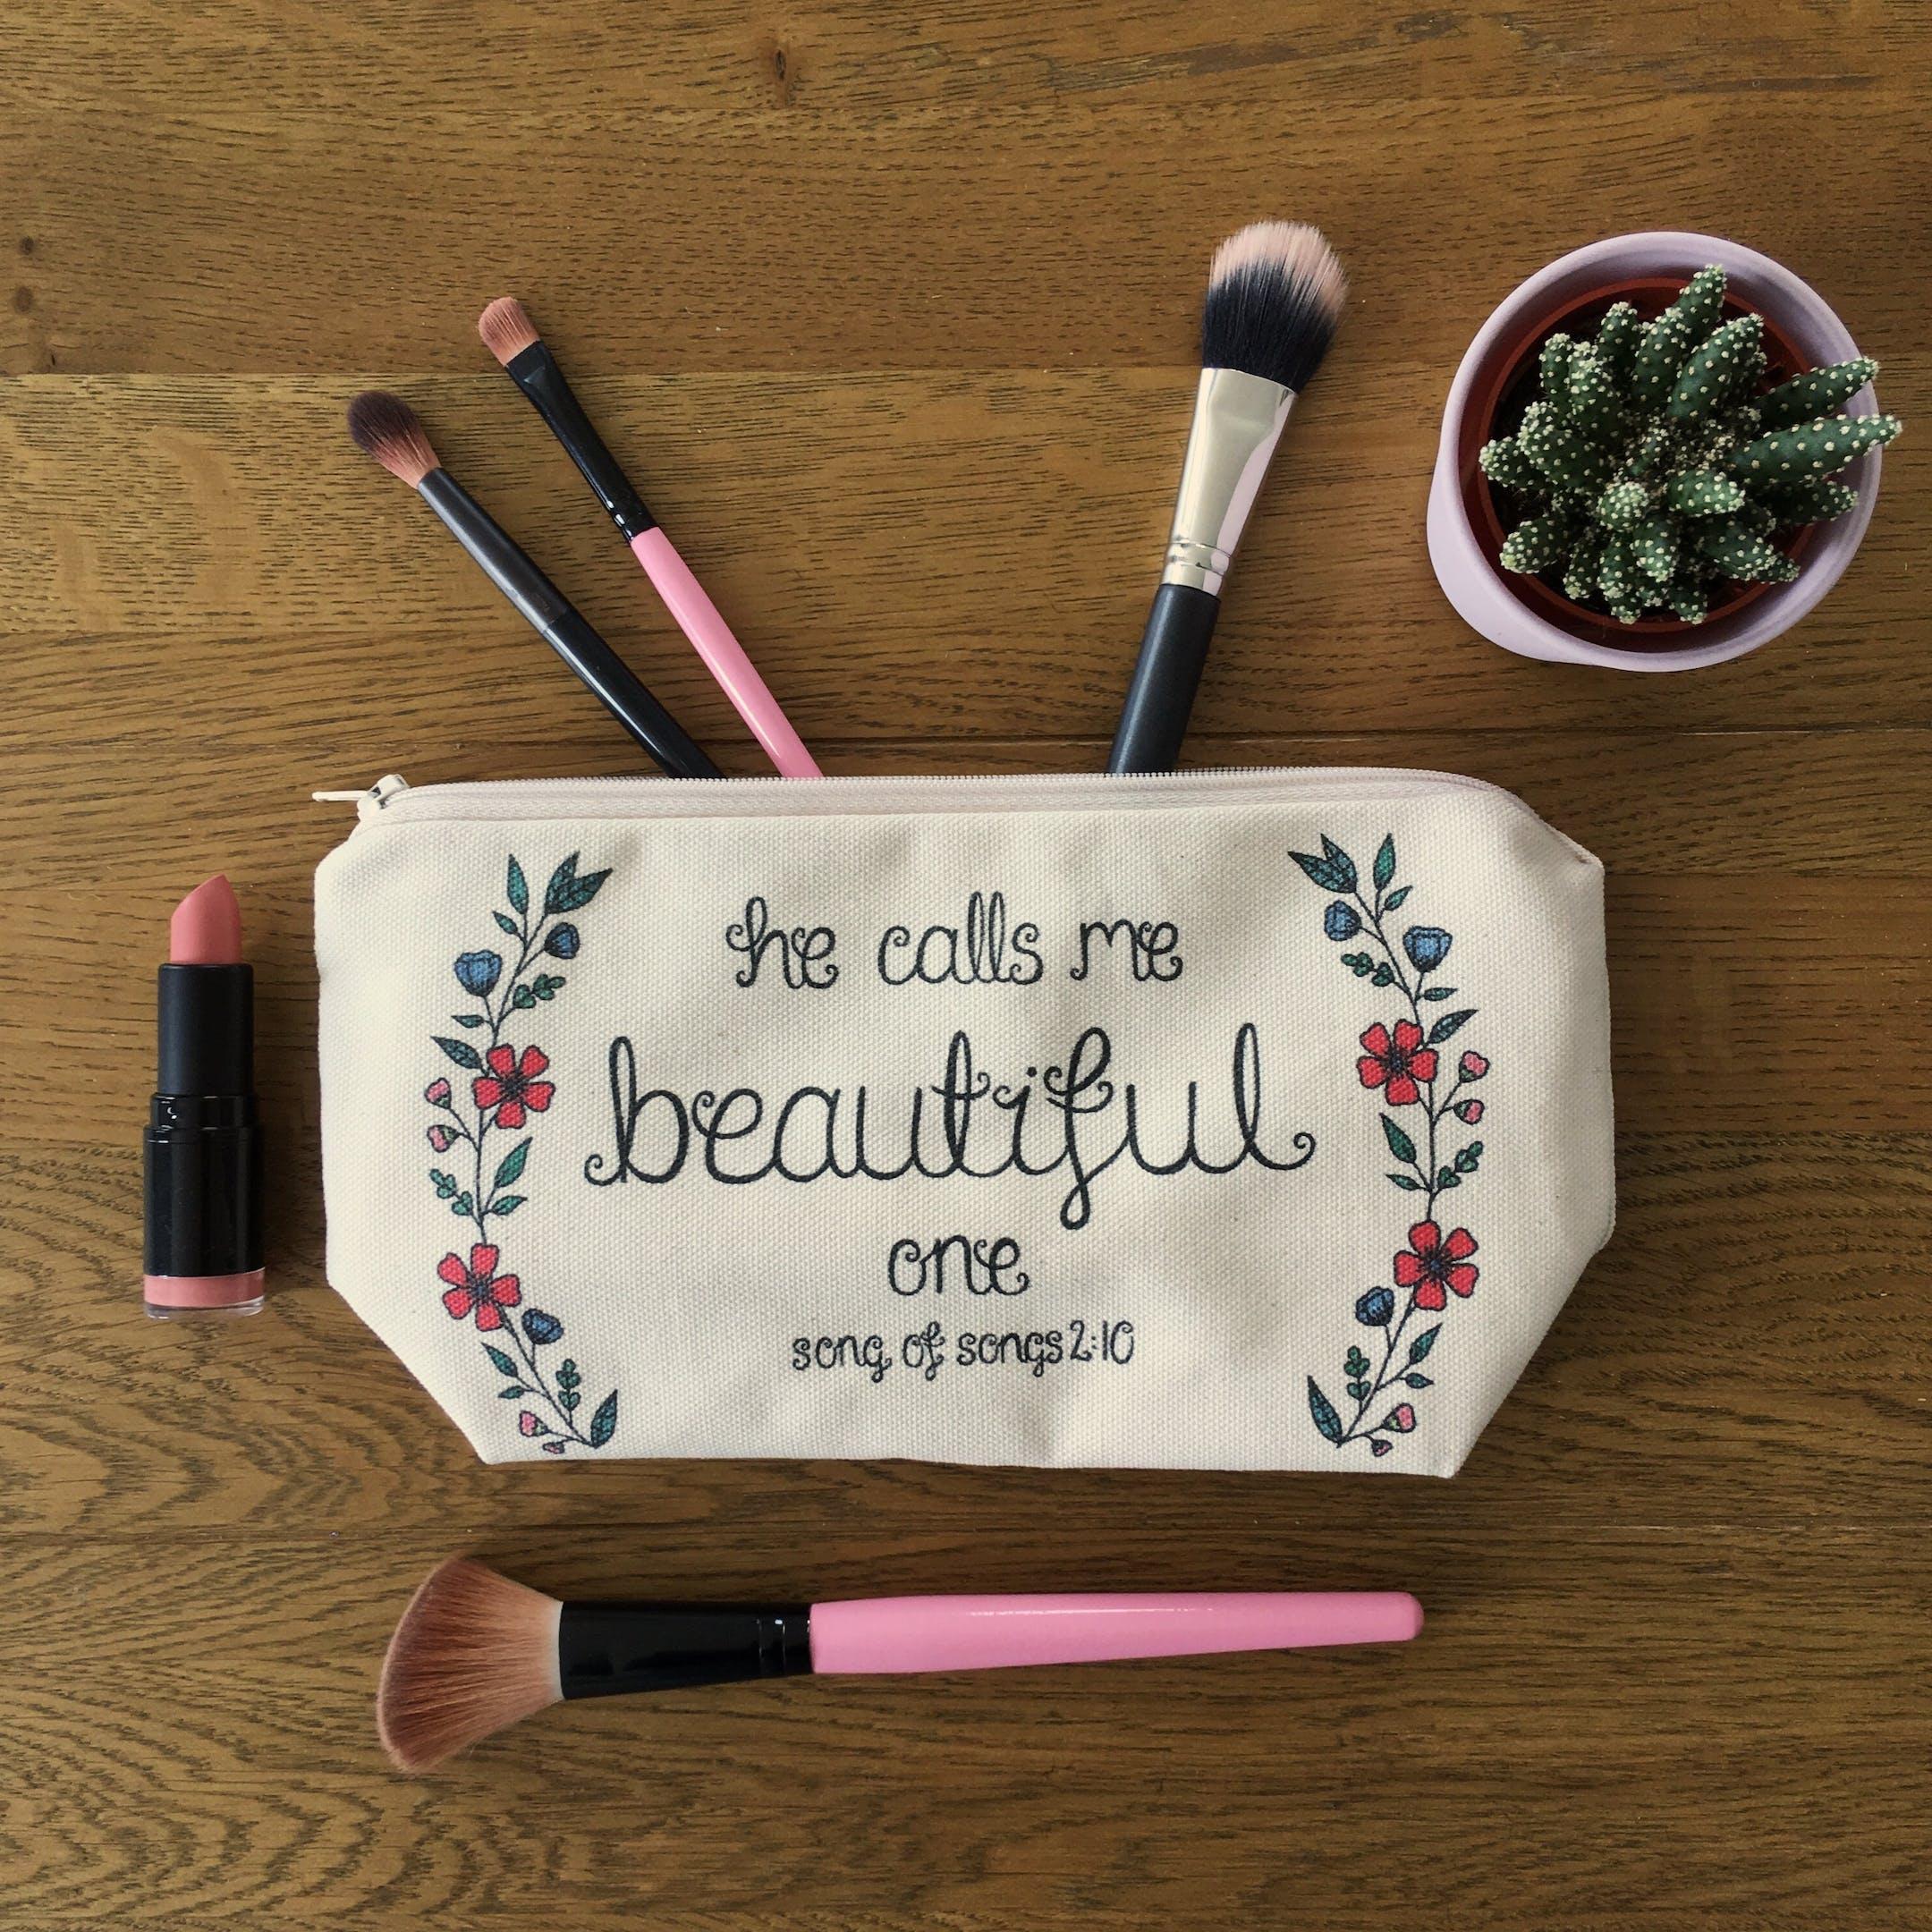 He Calls Me Beautiful Christian Makeup Bags | Treasured Creativity | Cheerfully Given - Christian Gifts UK